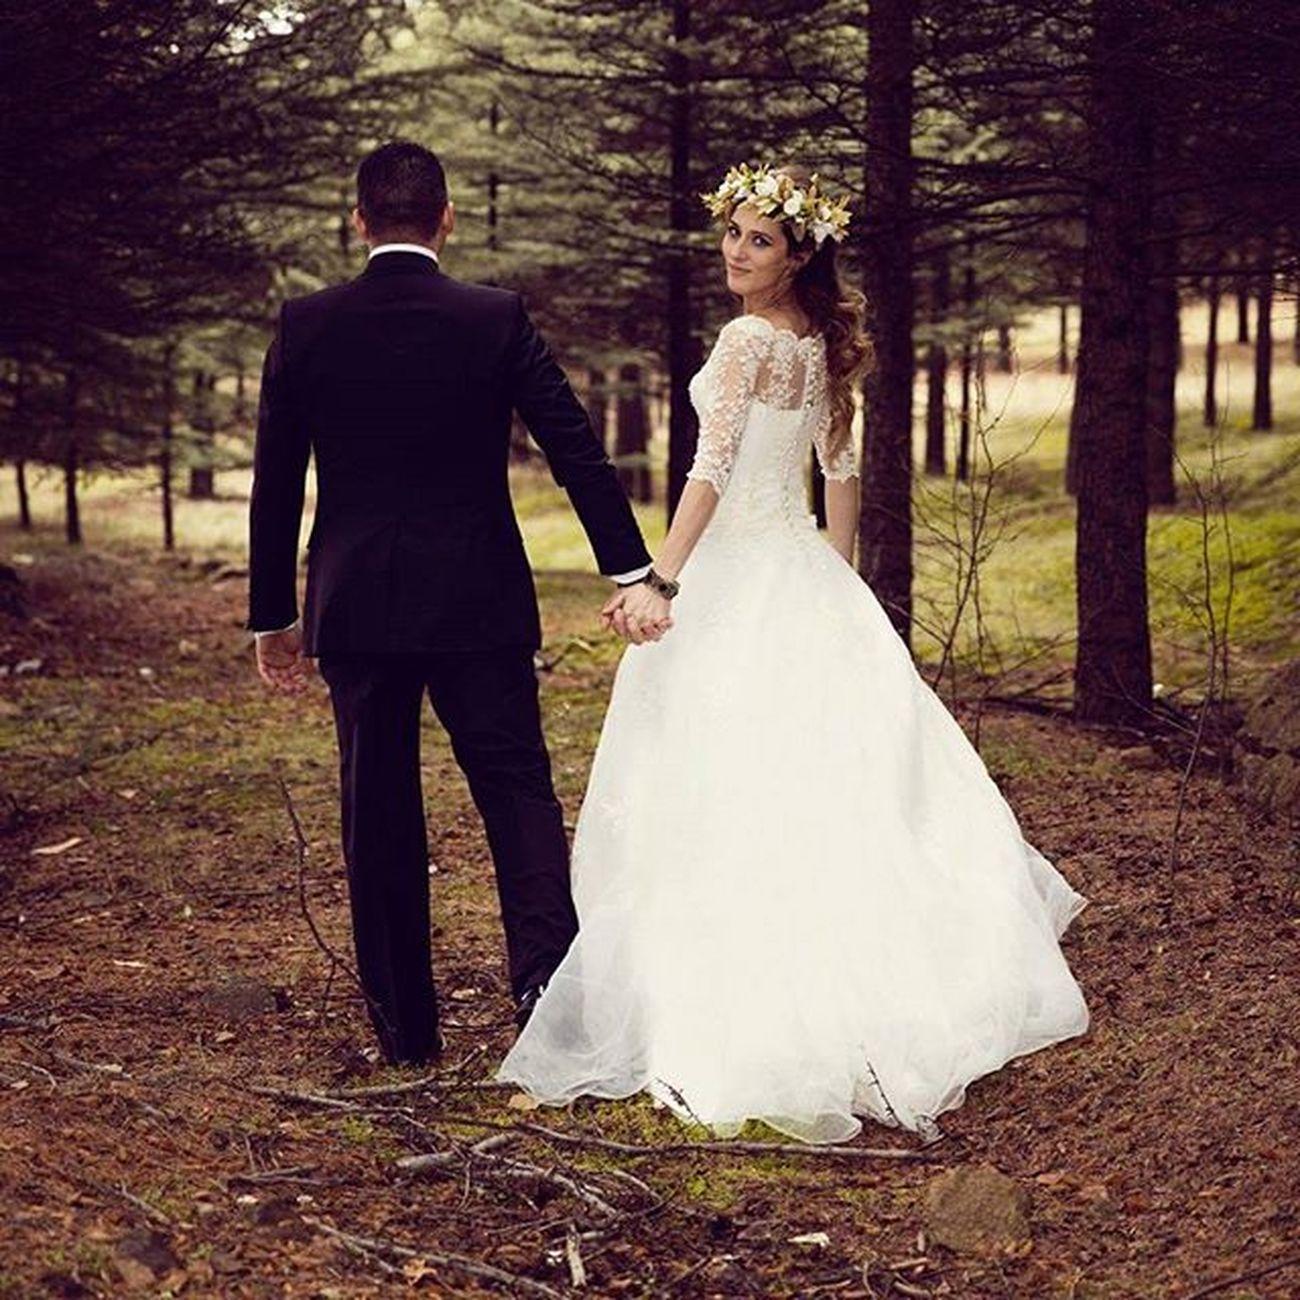 Photo:@mrrywedding hair&makeup:@evrimmemili accessorise:@be.boutique Wedding Bride Weddingphotography Groom Dugun Dugunfotografcisi Ankara Gelin Gelinmakyajı Photoshoot Fotoğrafçekimi Profesyonelfotograf